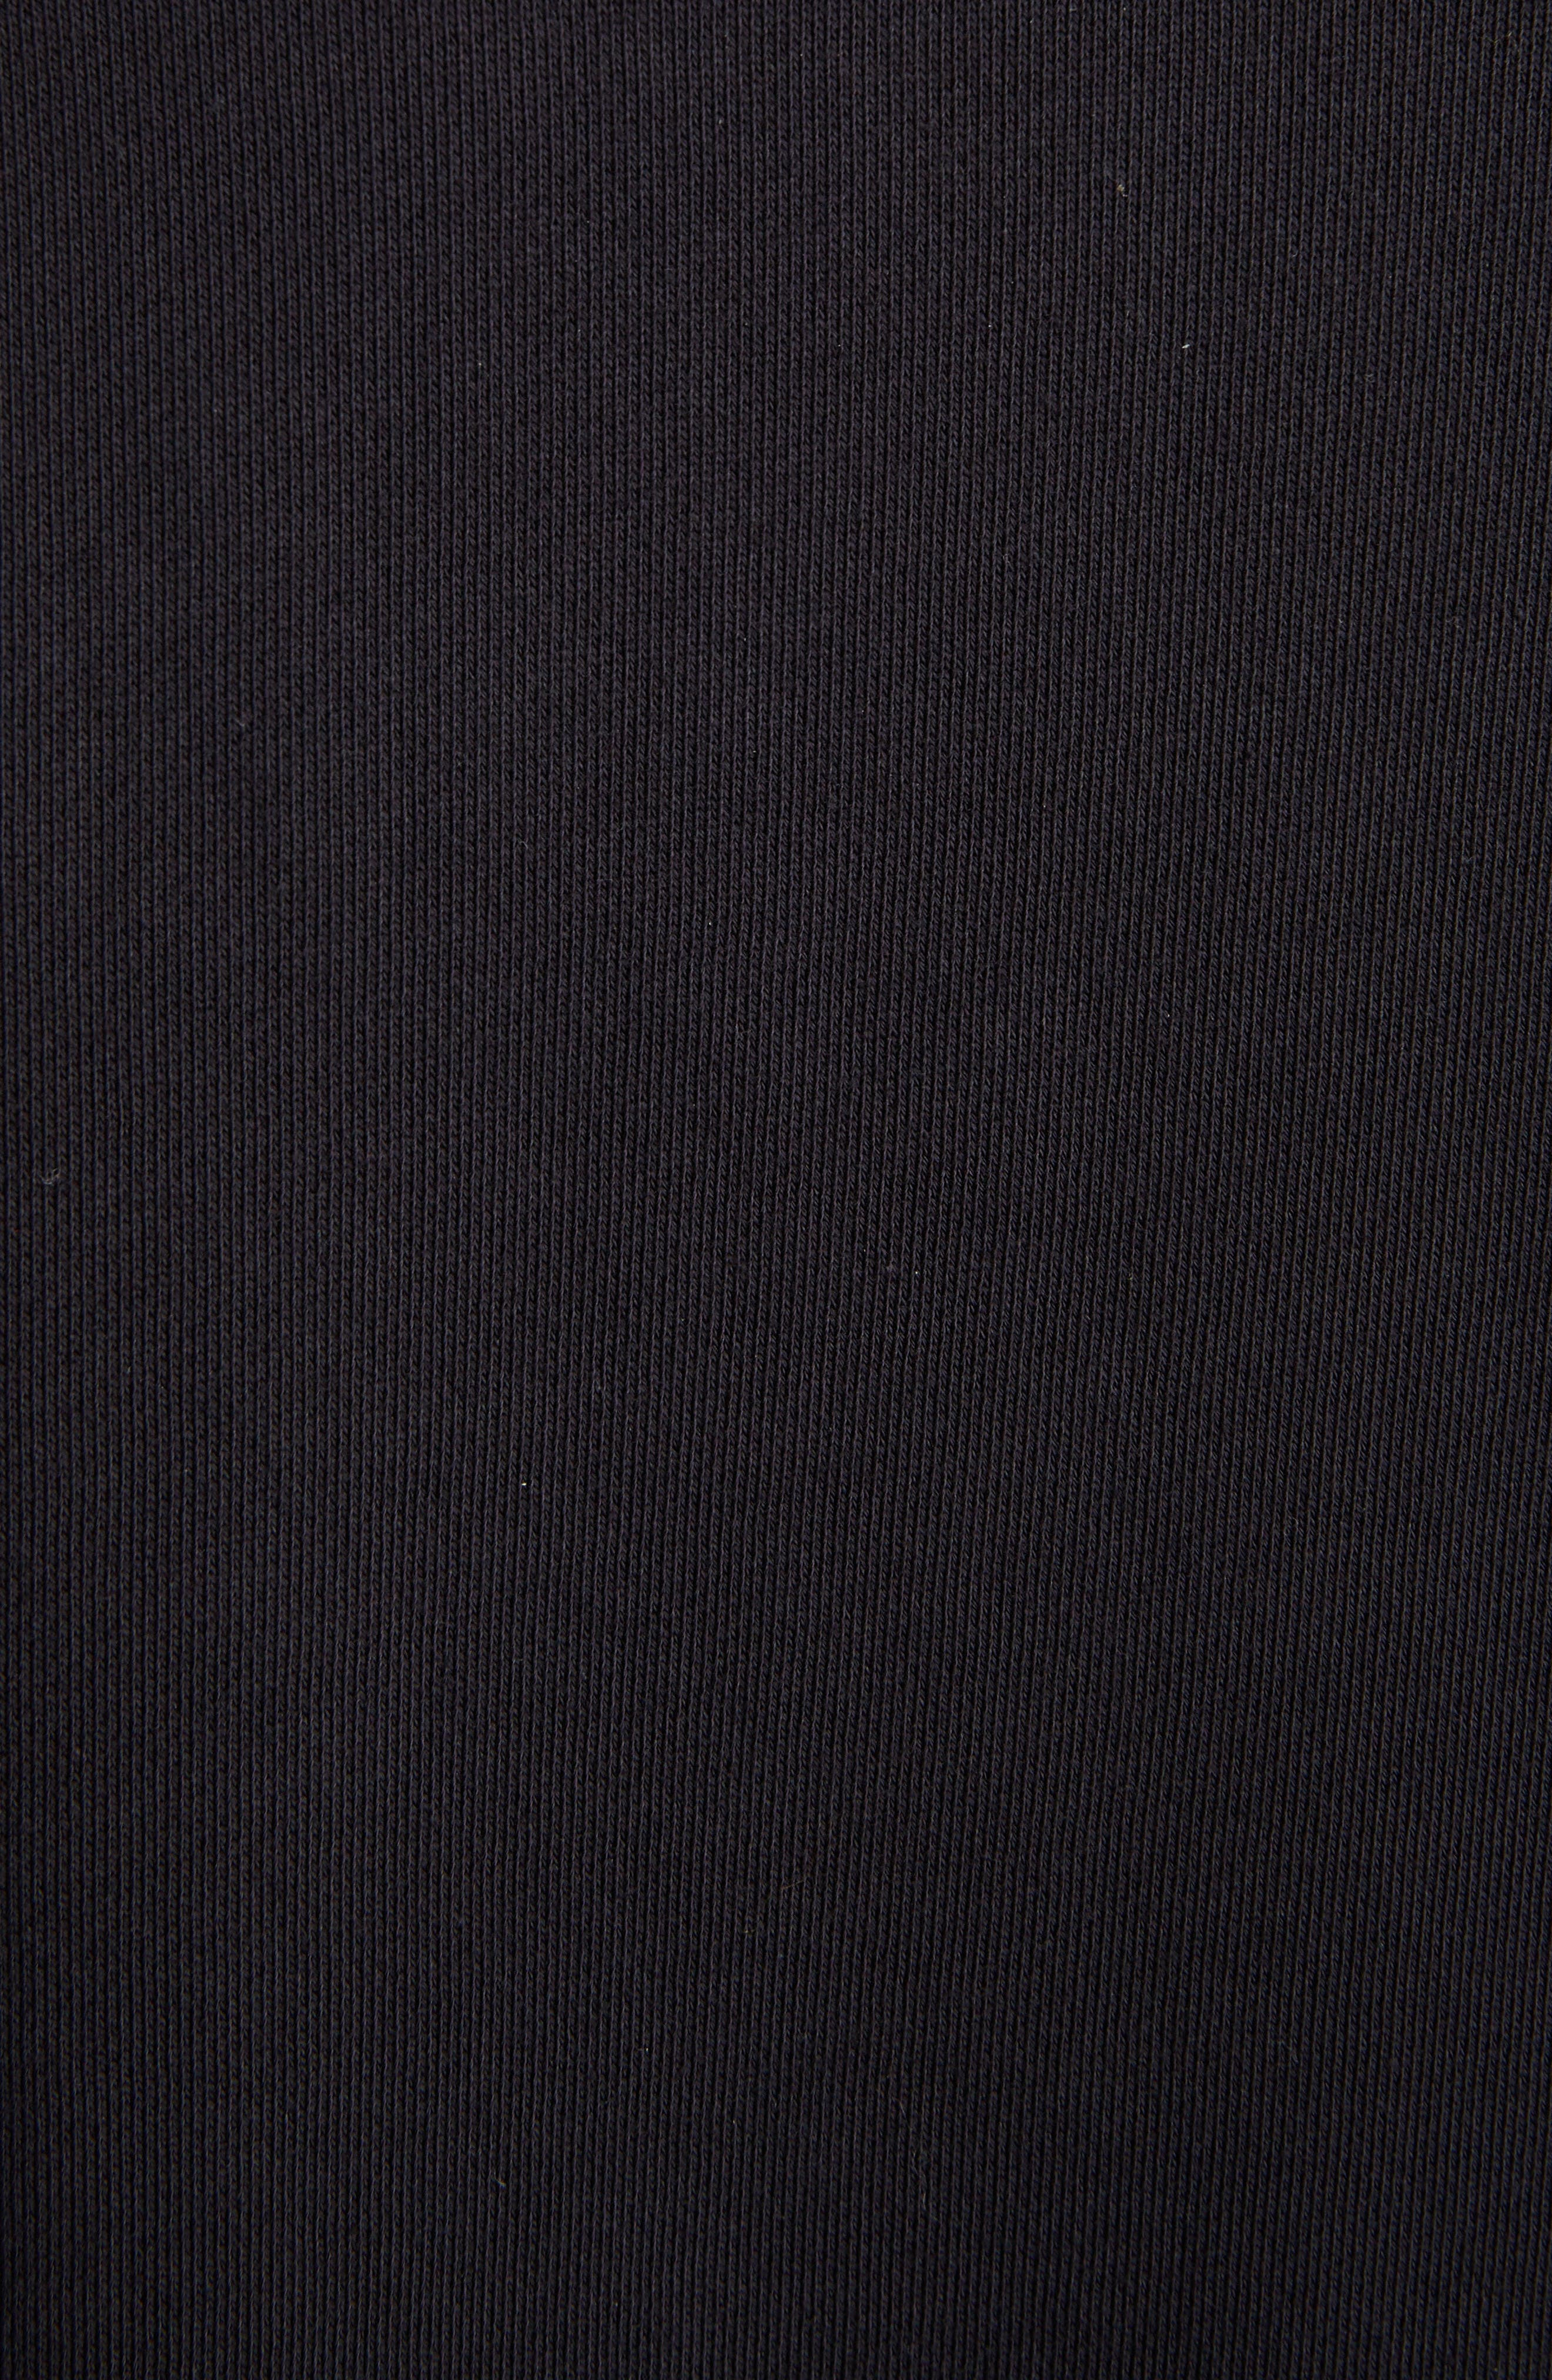 DRIES VAN NOTEN,                             Fan Embroidered Sweatshirt,                             Alternate thumbnail 5, color,                             001